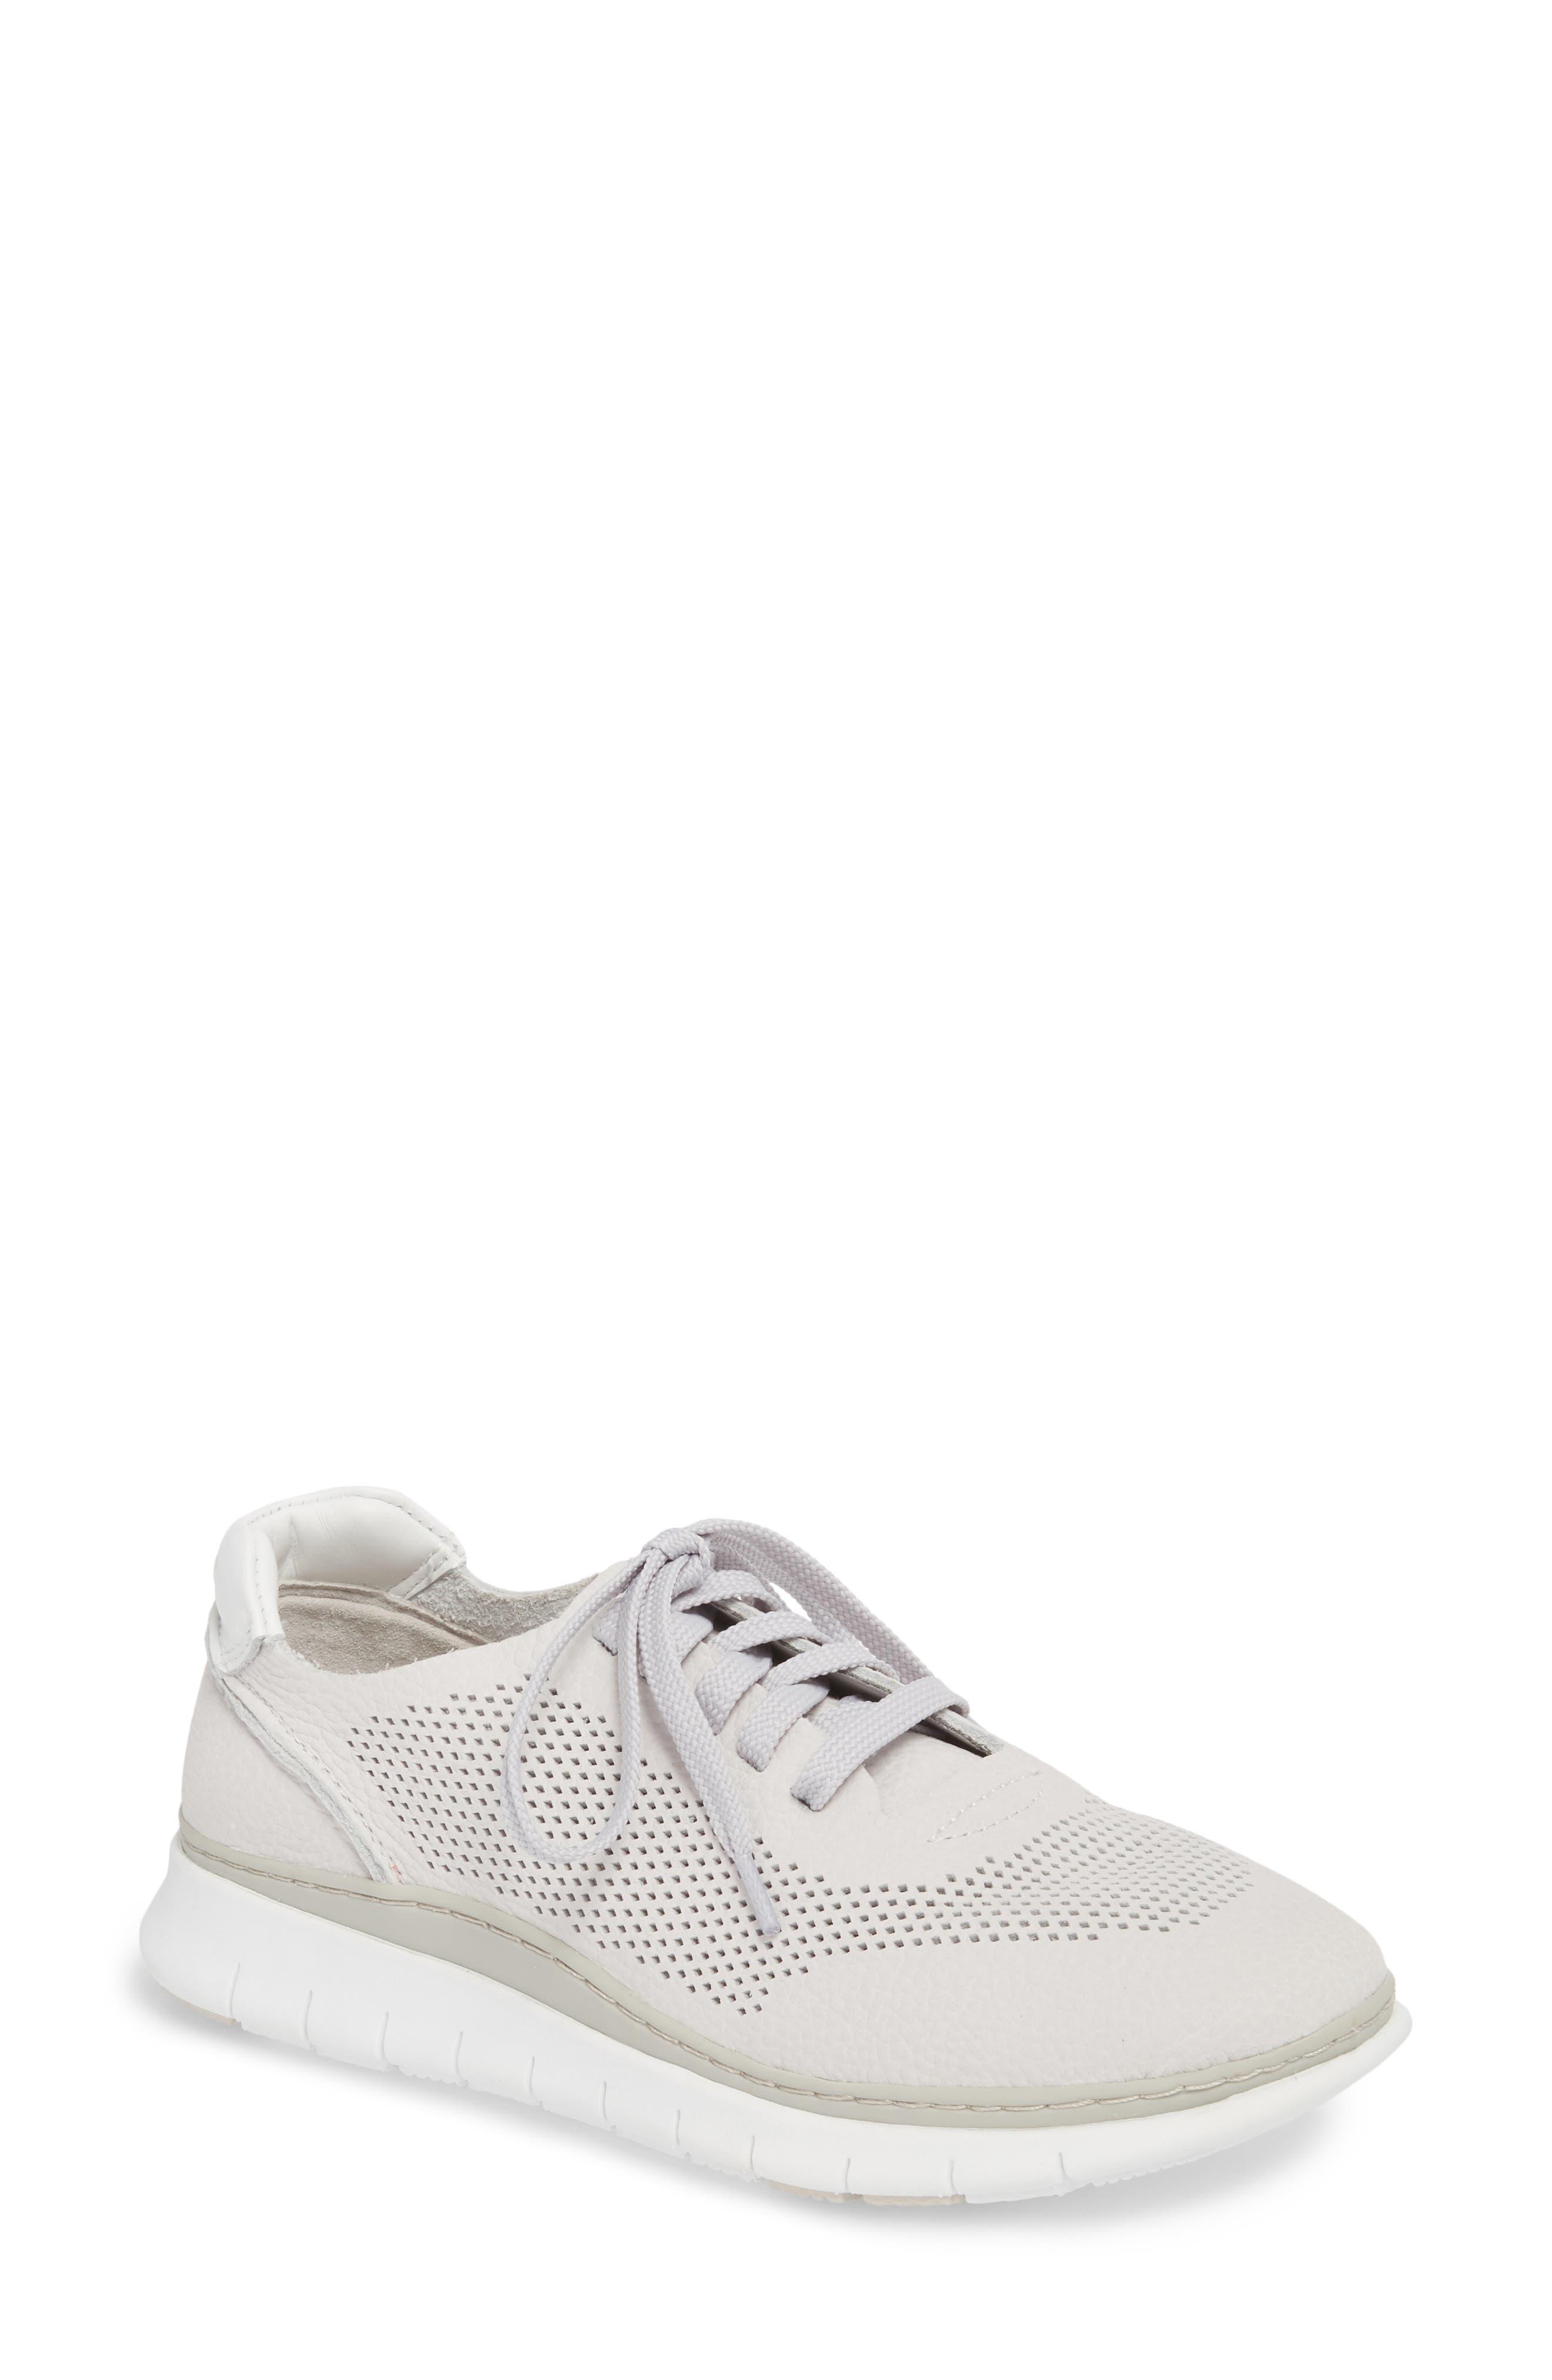 Vionic Joey Sneaker, Grey